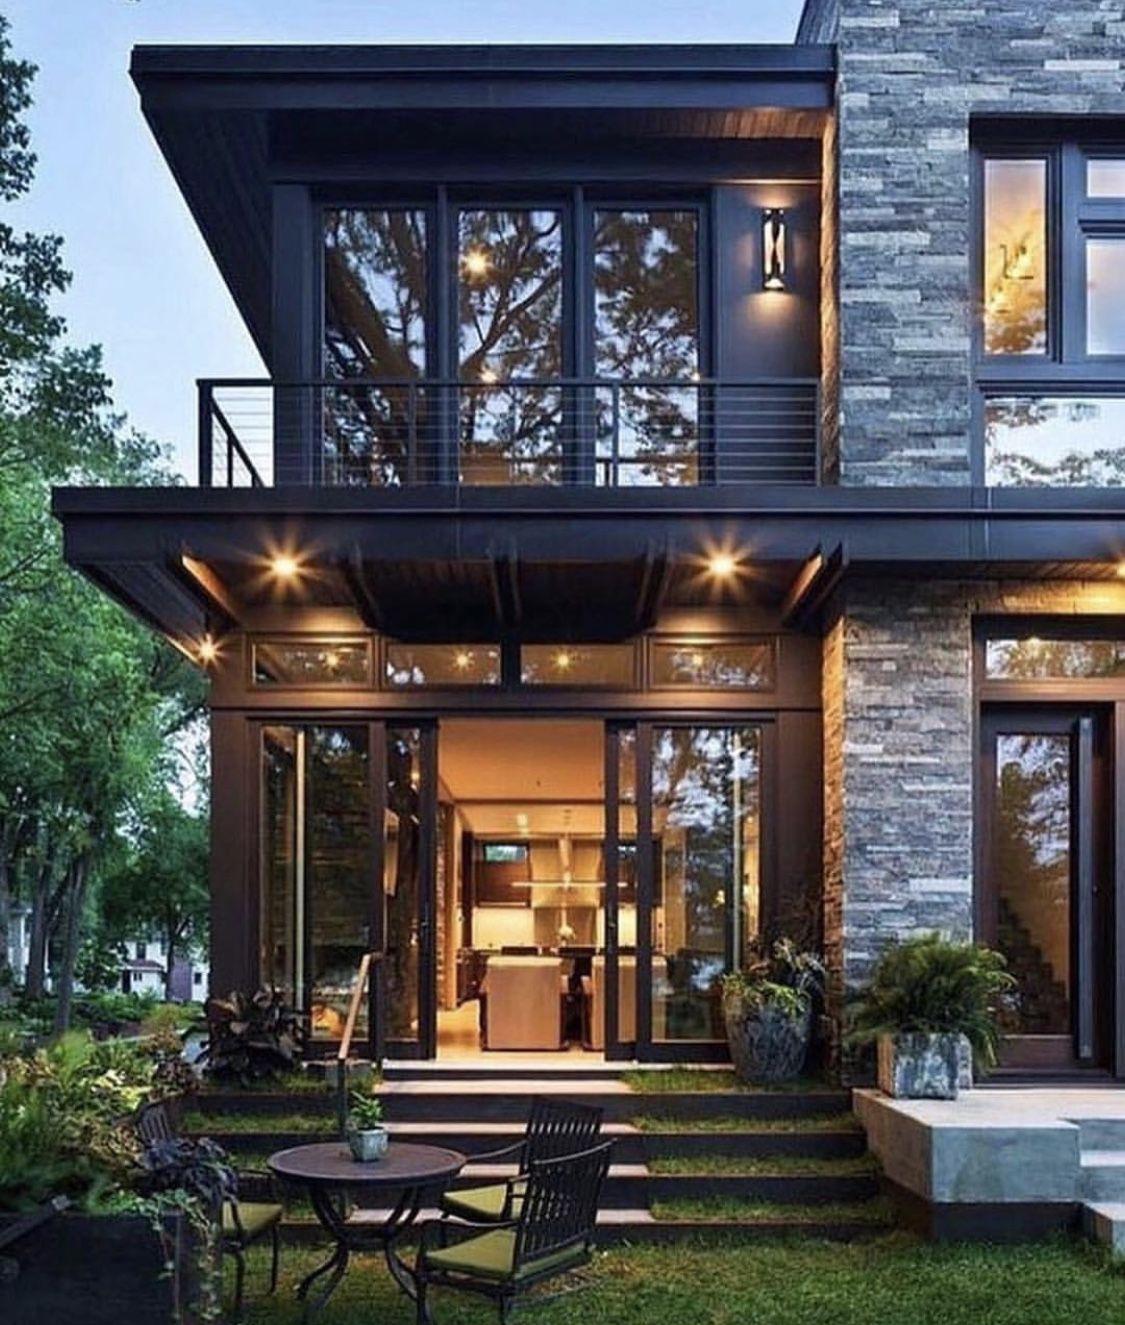 Minneapolis usa cool house designs modern design beautiful homes stunningly also pin by rafa miodowski on houses in pinterest rh